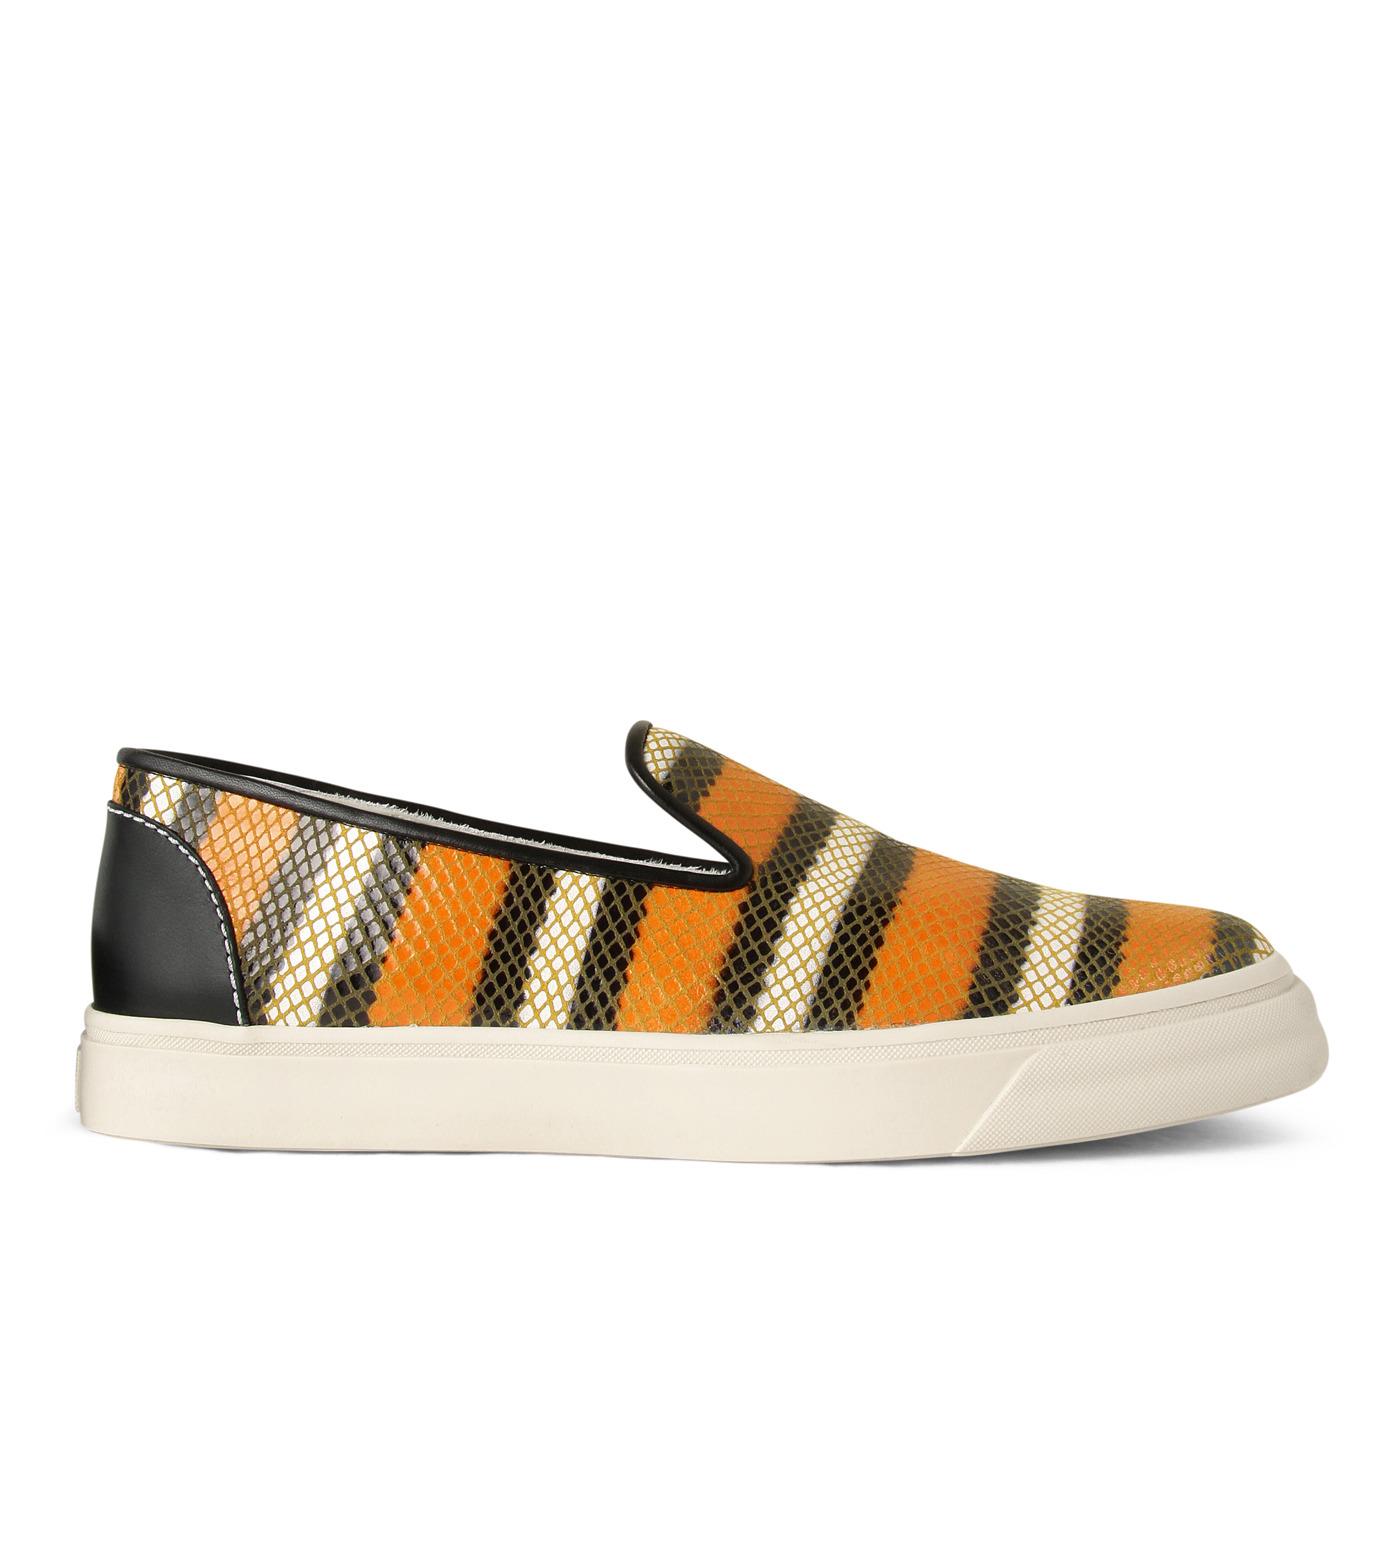 Giuseppe Zanotti Design(ジュゼッペザノッティ)のStripe Slip-On Sneaker-RED(シューズ/shoes)-RM5043MD-62 拡大詳細画像1